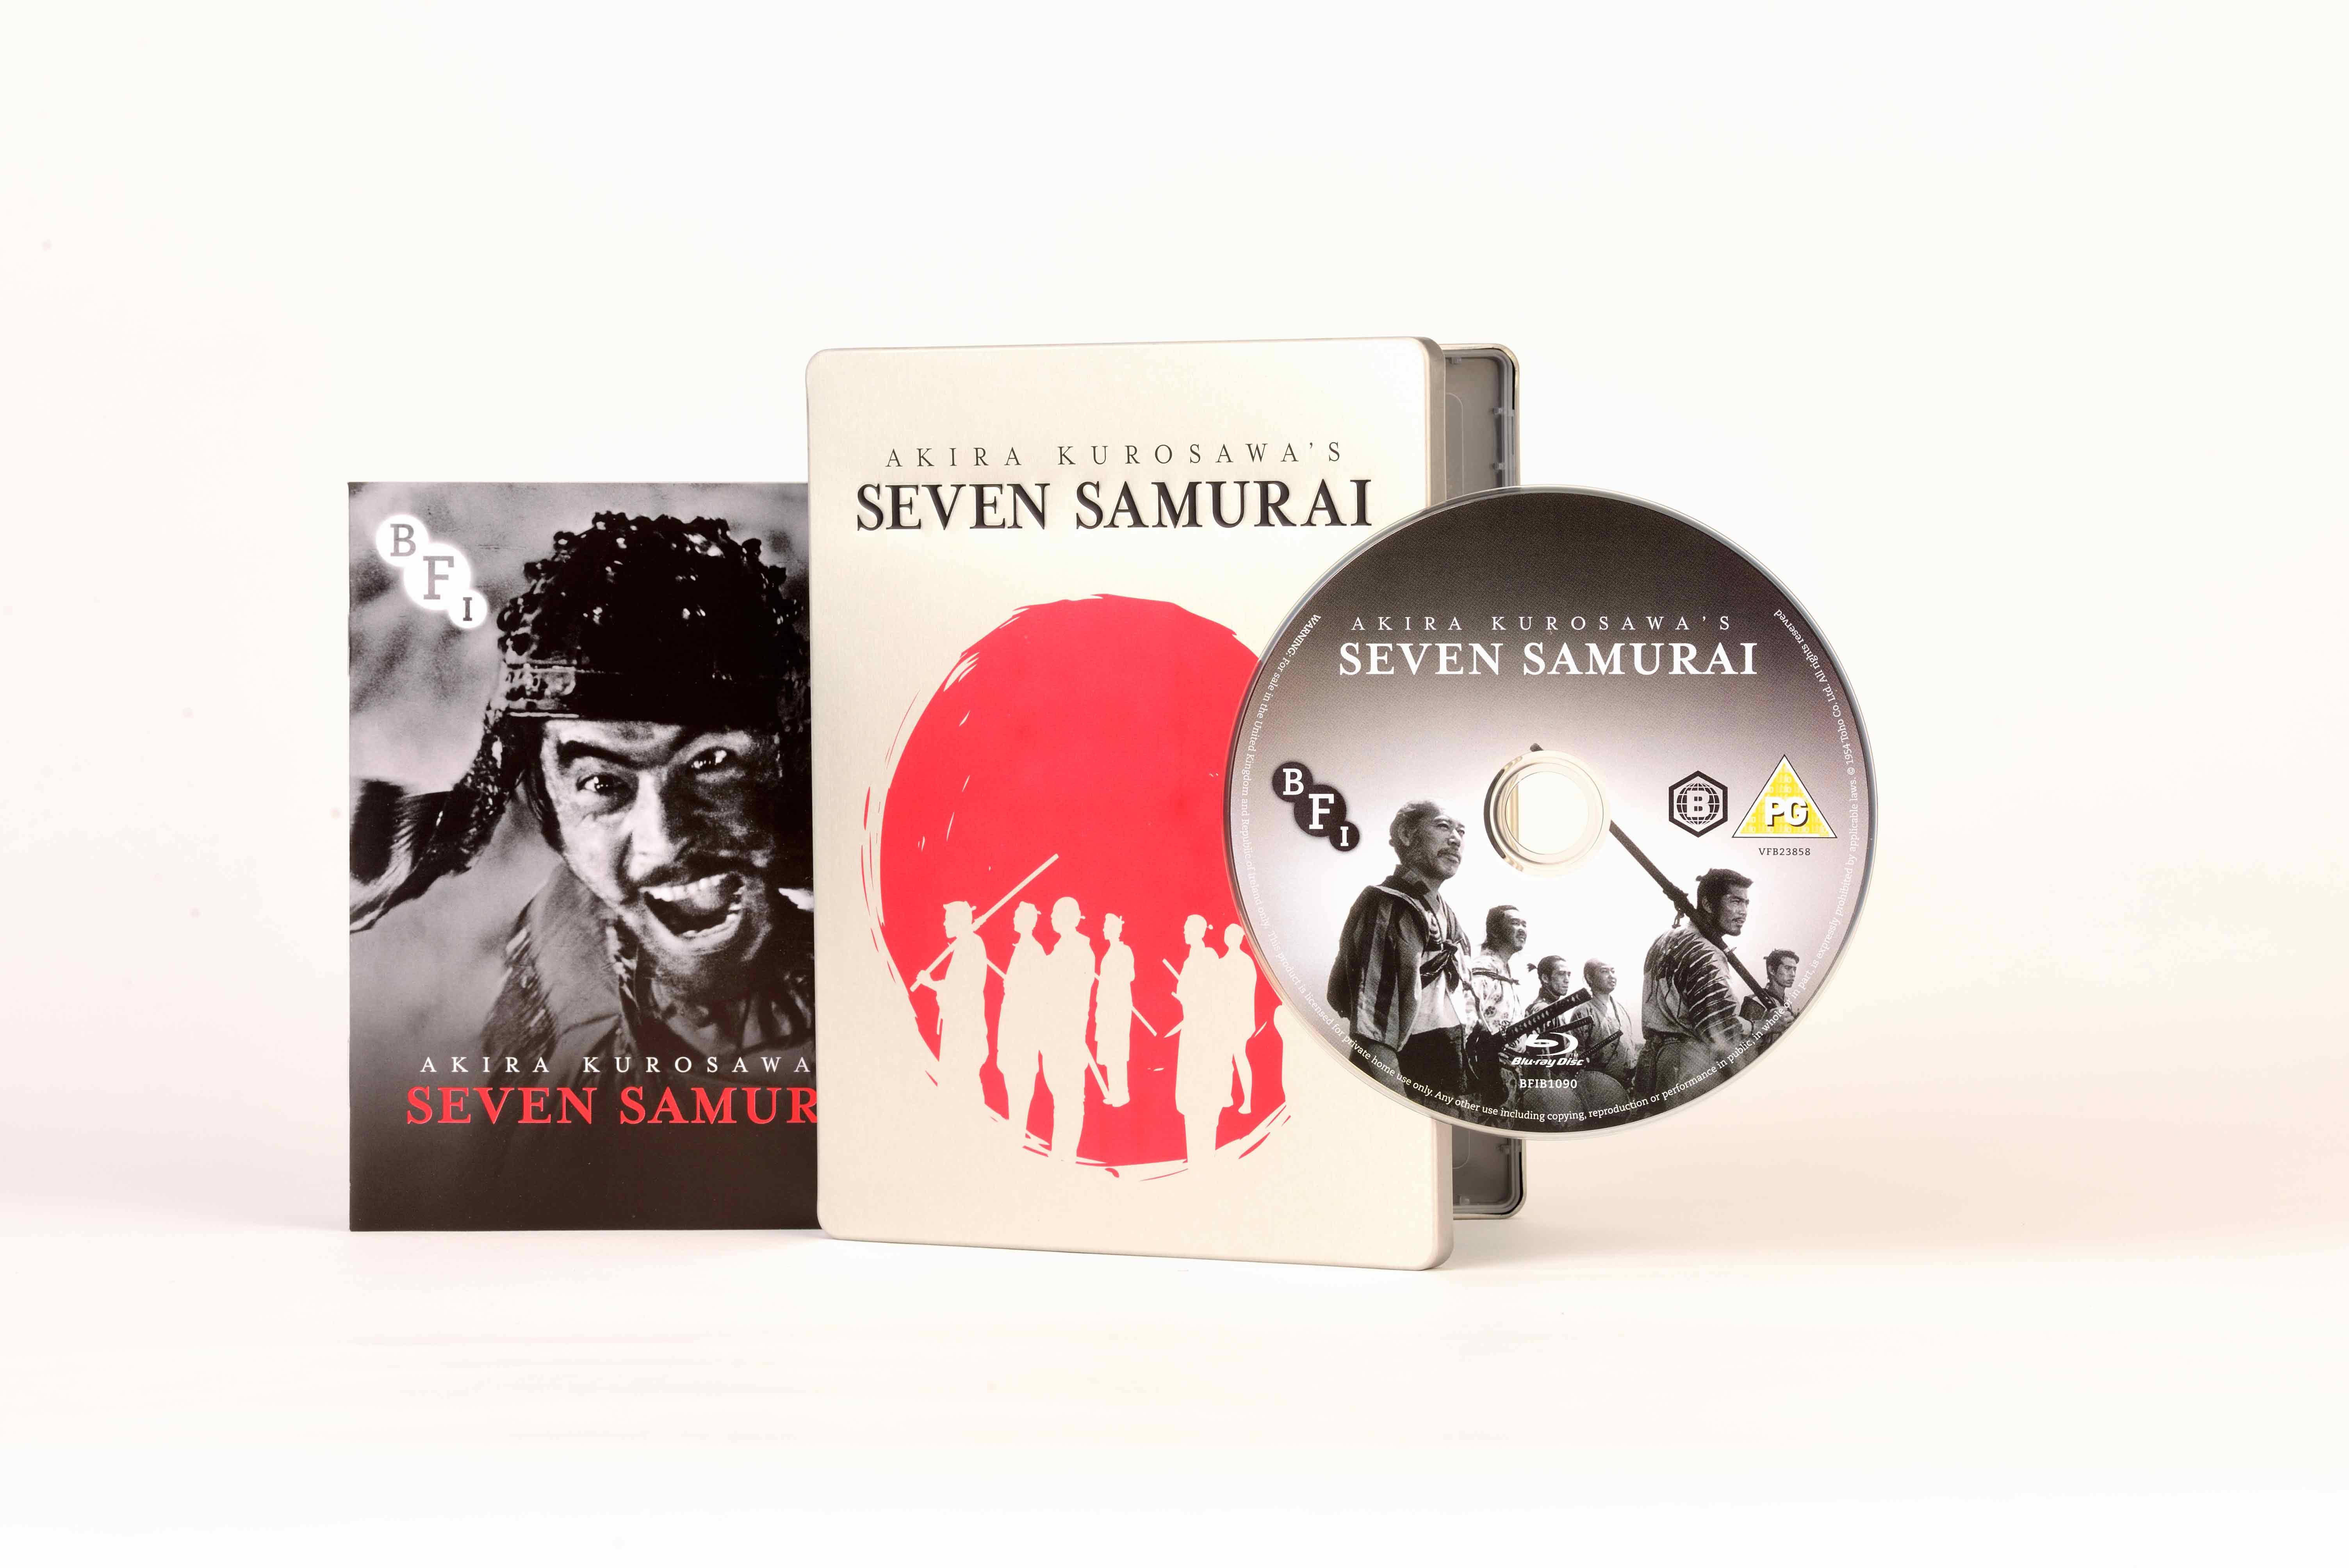 Buy Seven Samurai LIMITED EDITION BLU-RAY STEELBOOK